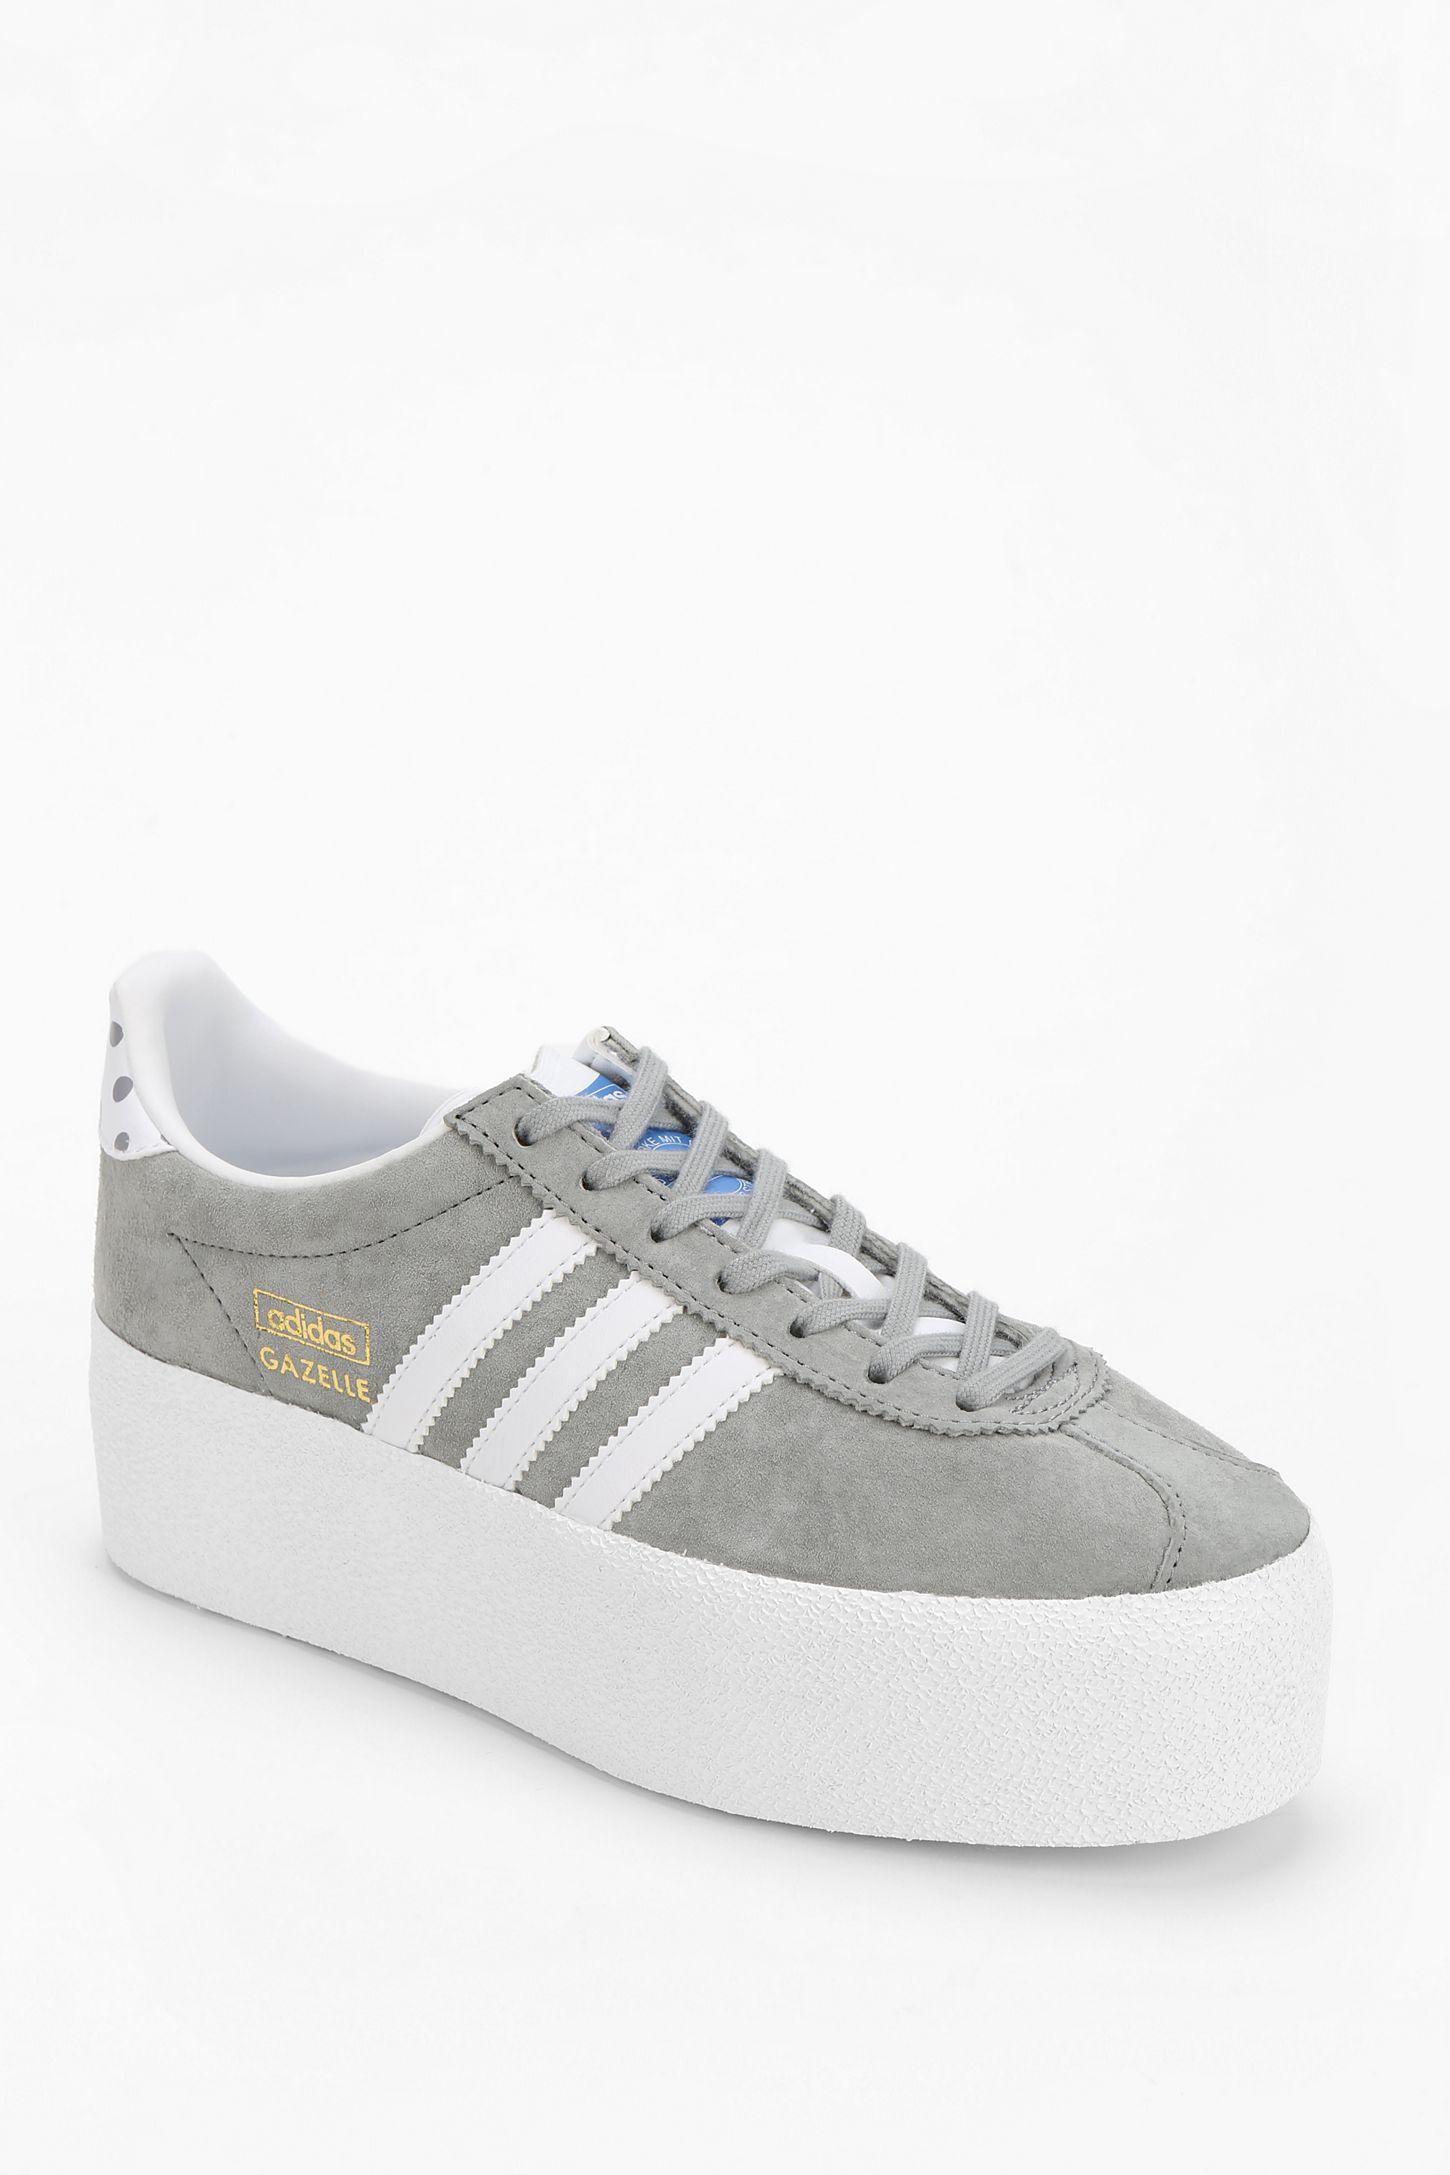 ac6379cd98f adidas Originals Gazelle Platform Sneaker